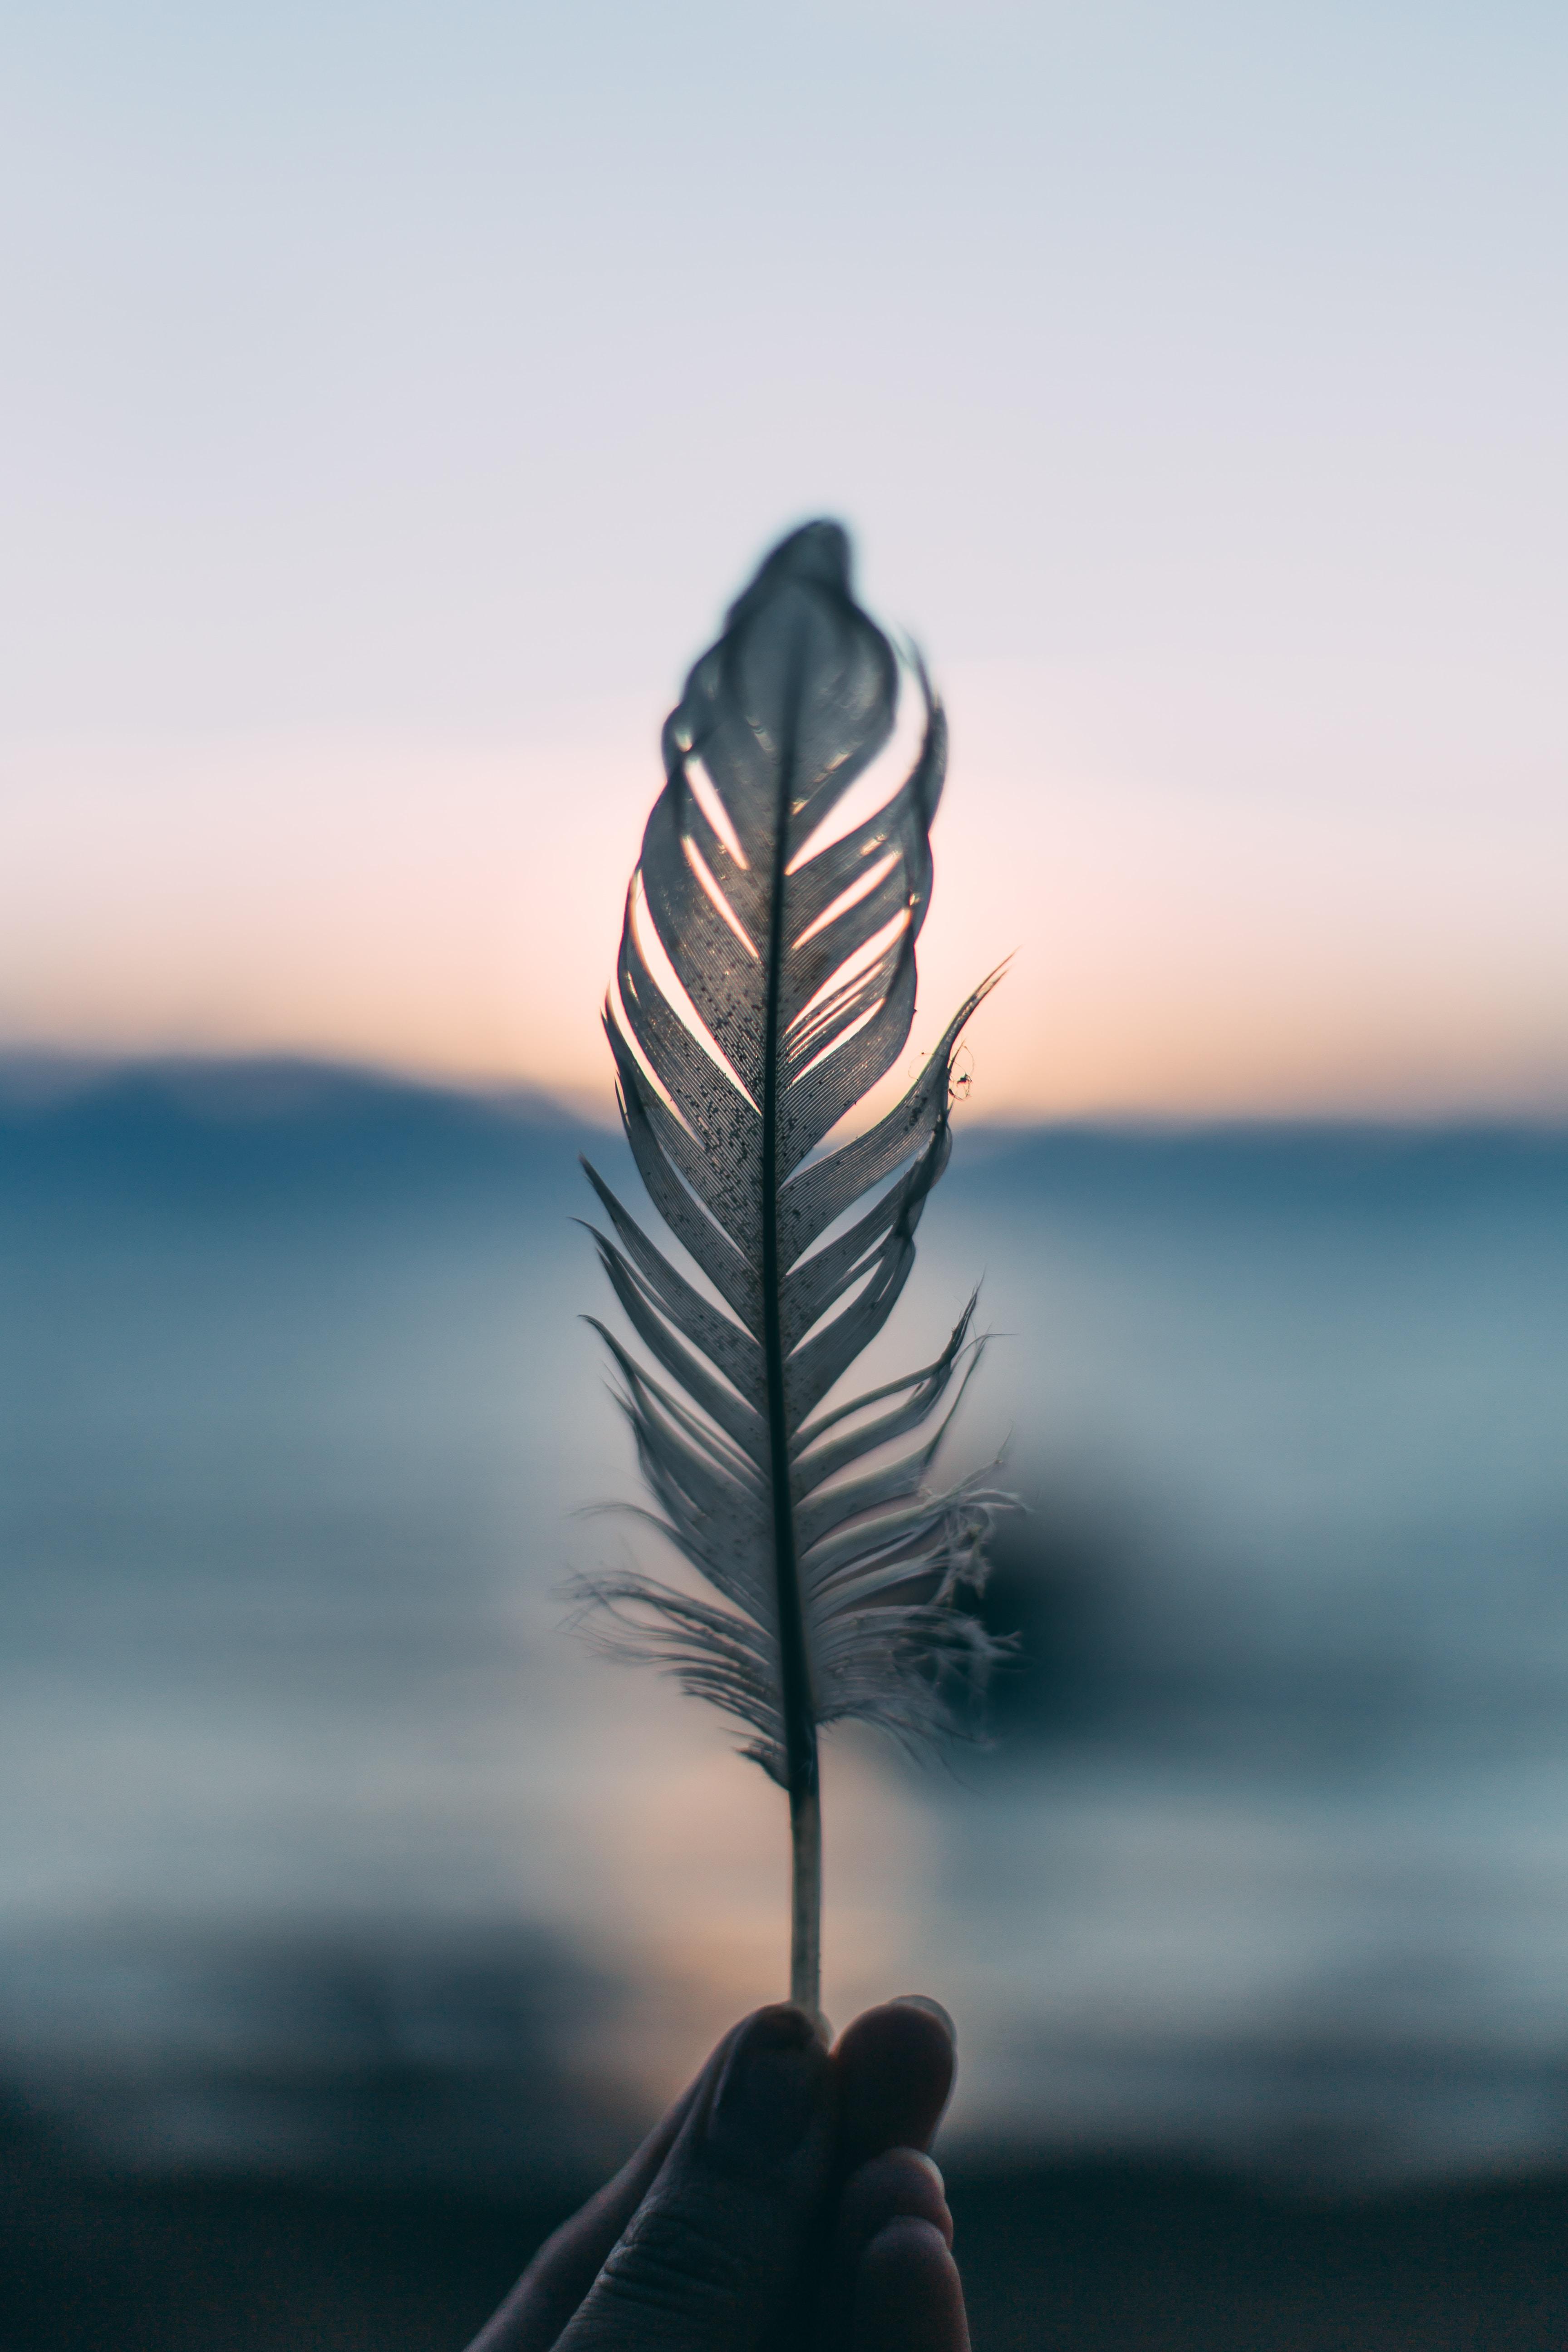 Wings Of Courage poem stories